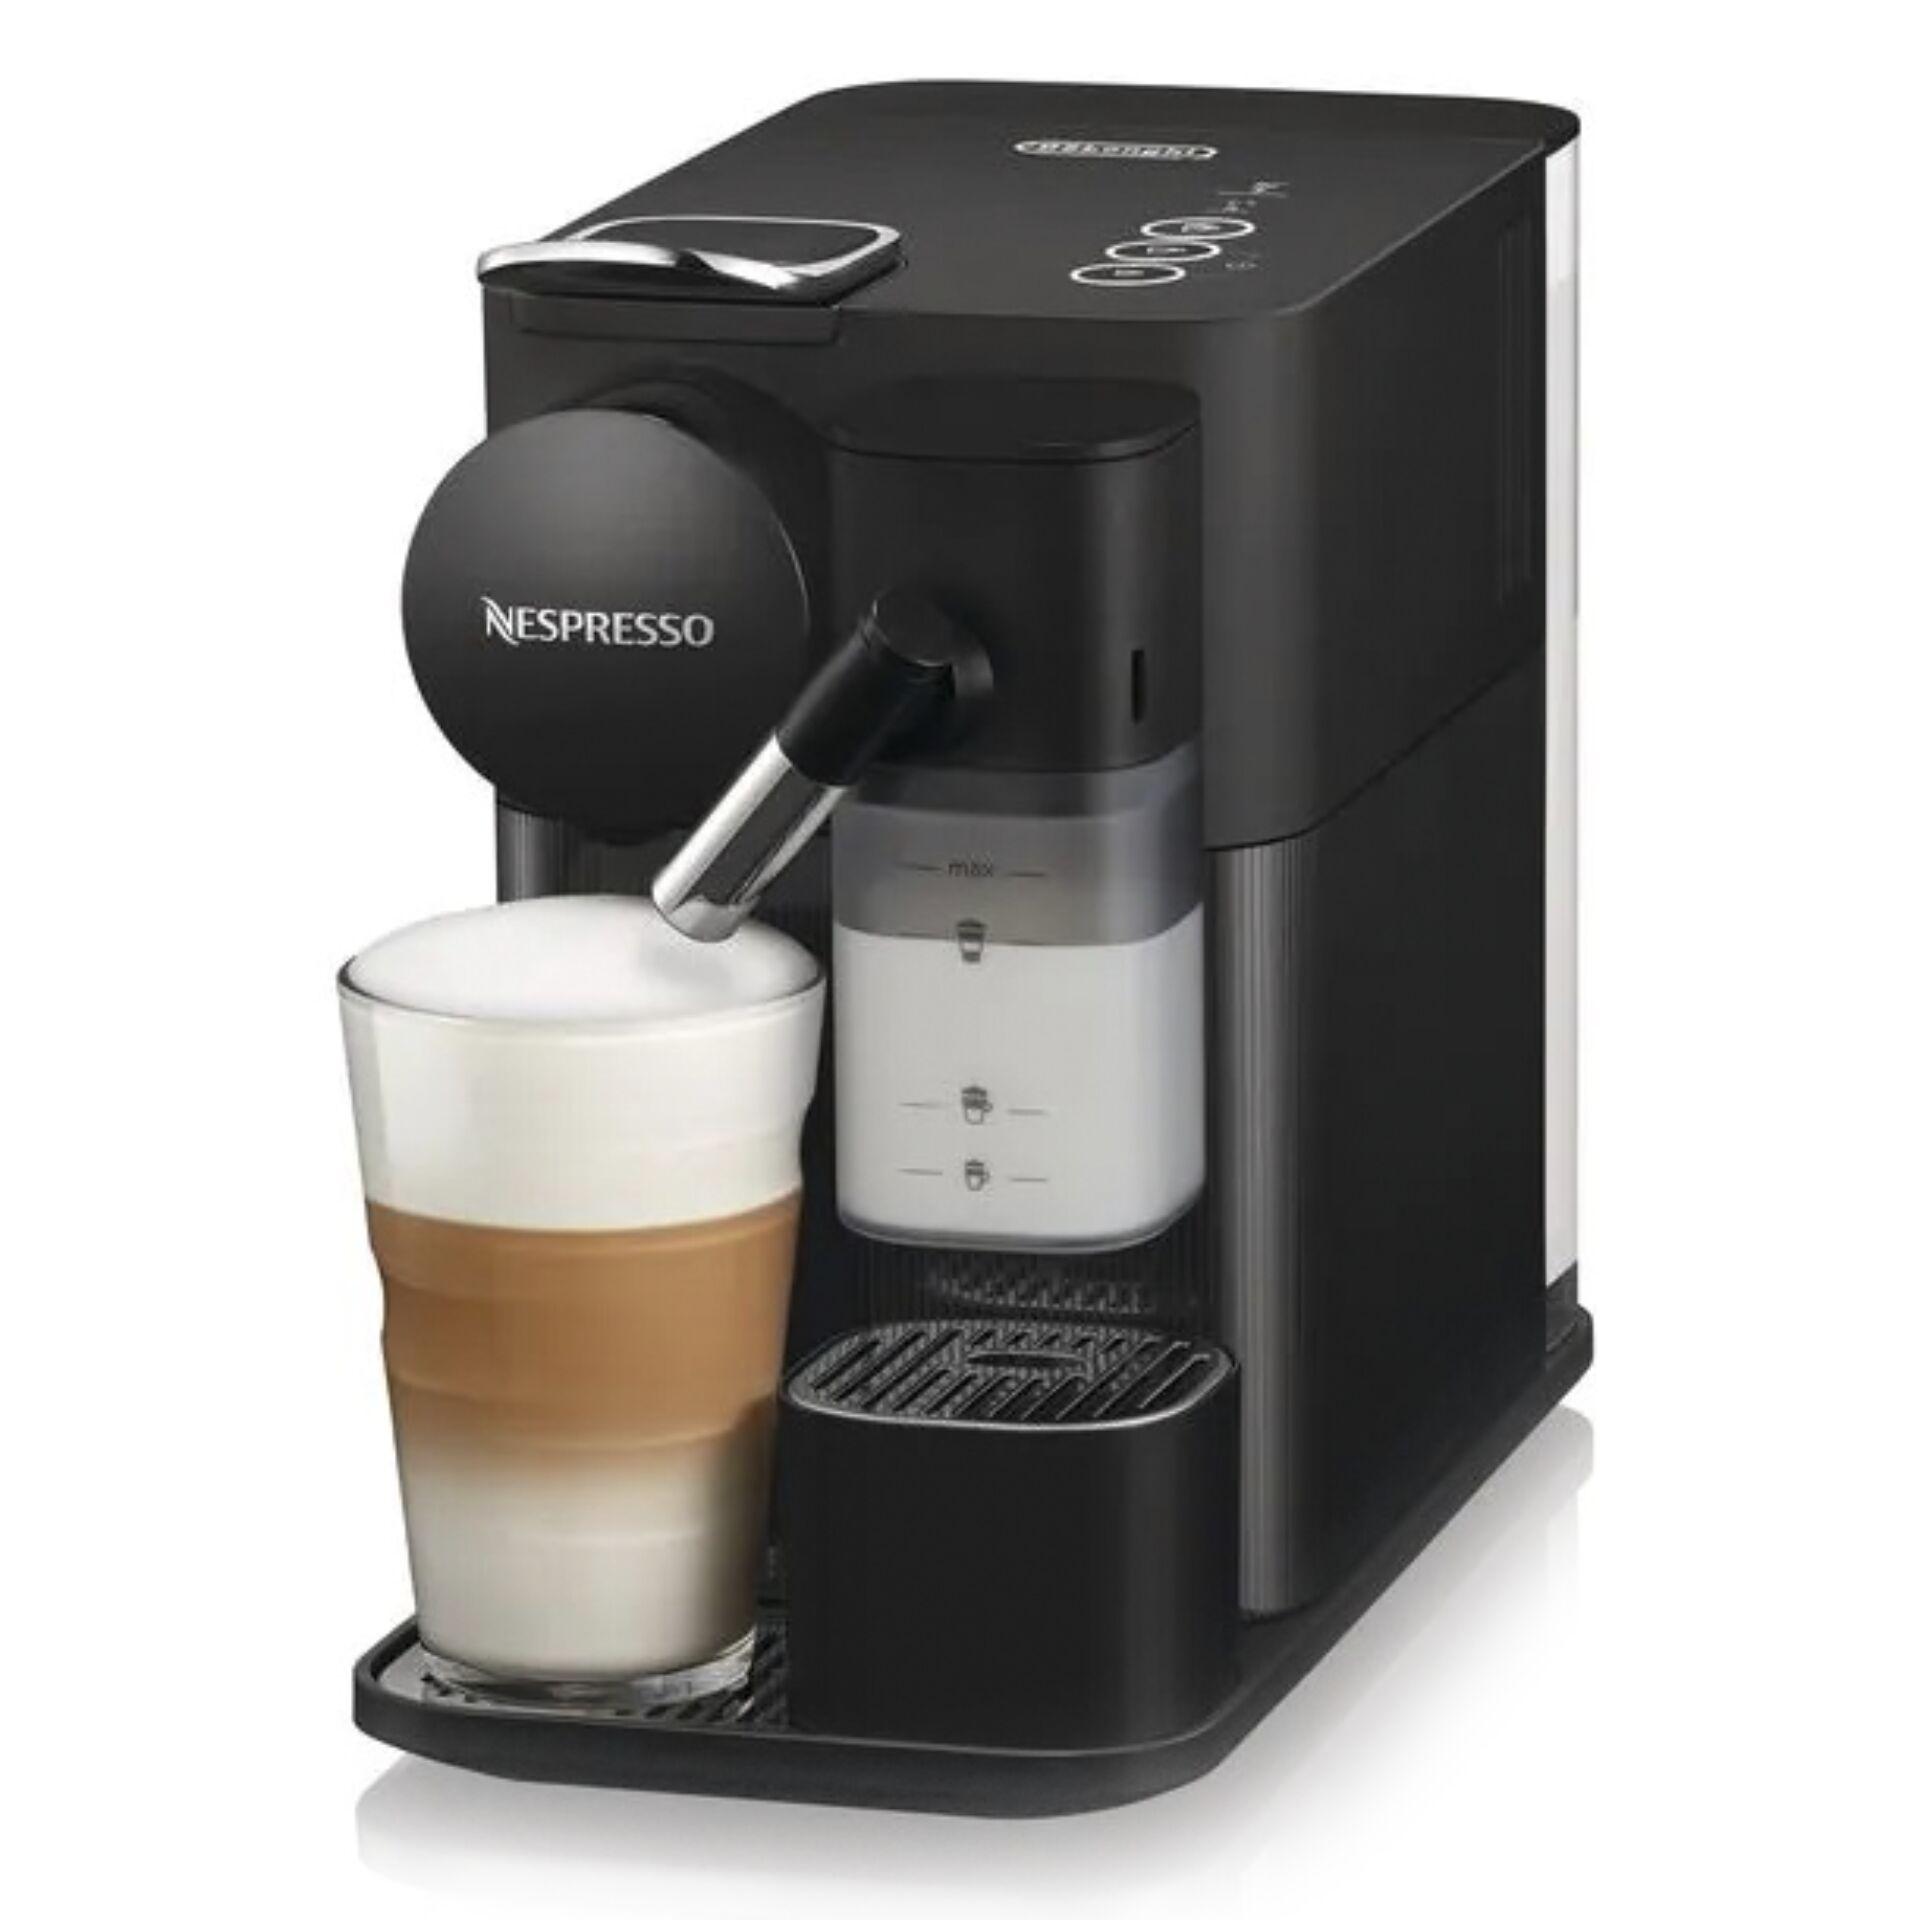 Delonghi EN510.B Nespresso